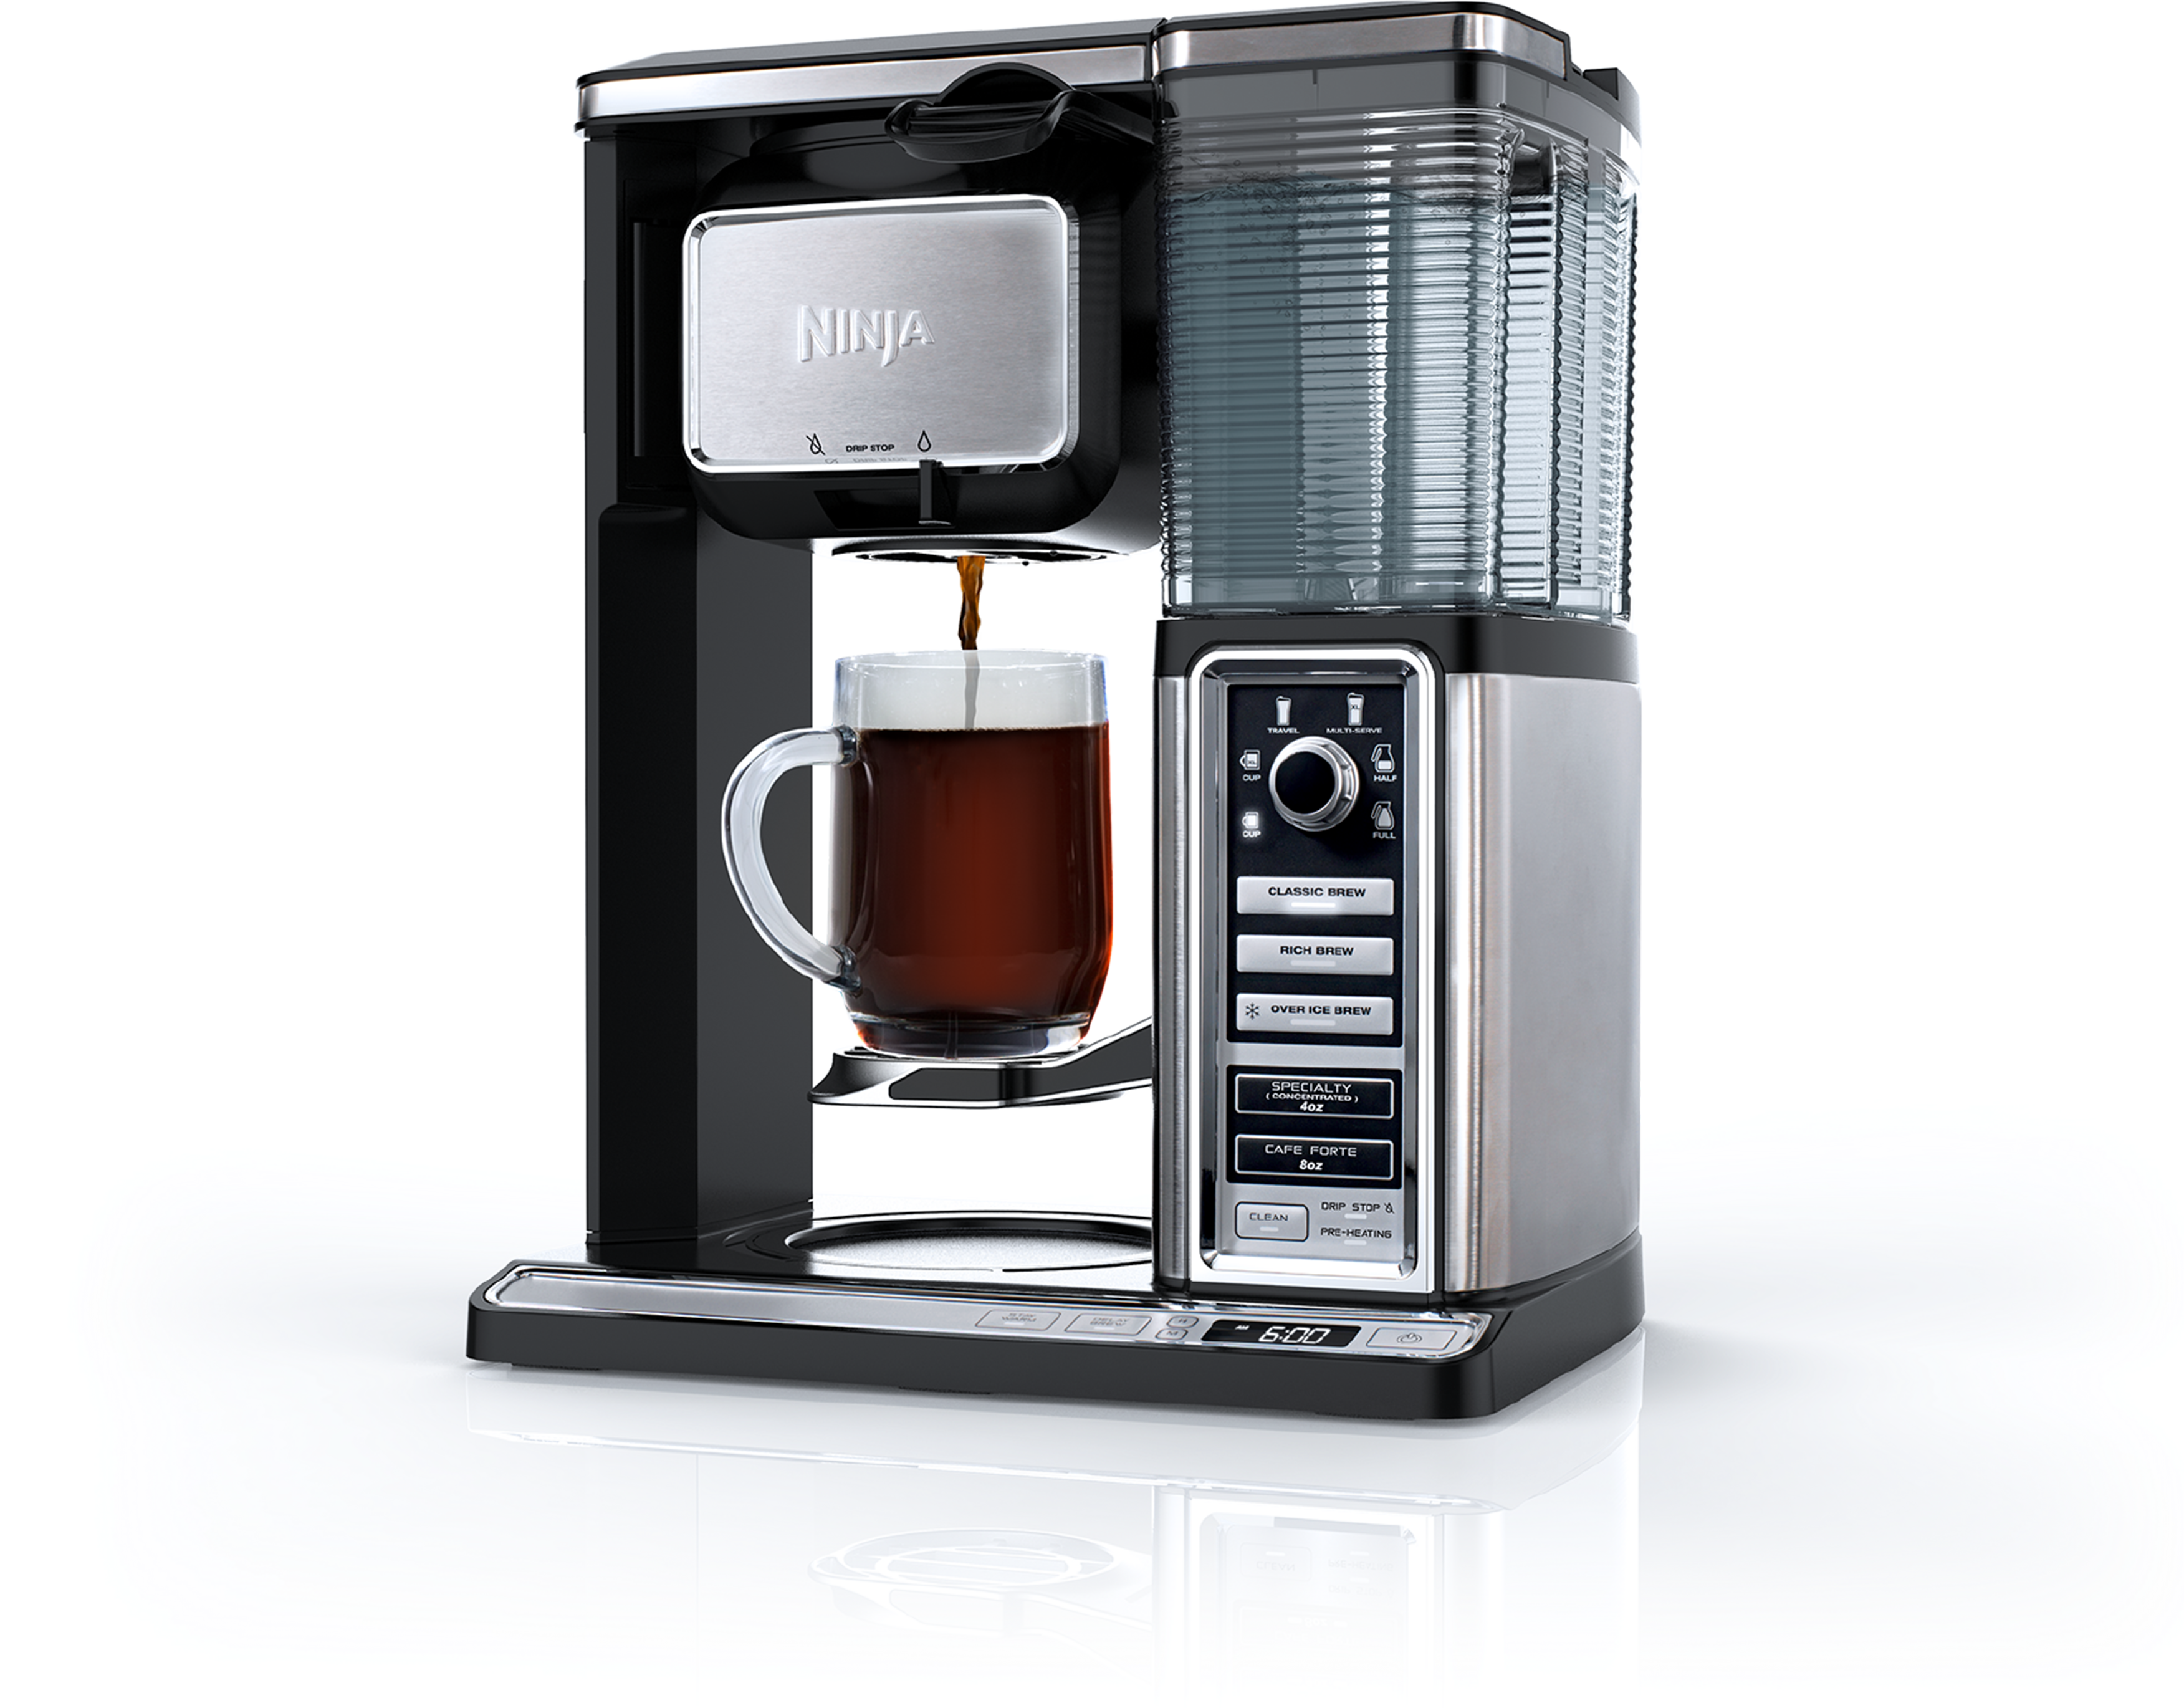 It's more than a coffeemaker. The nextgeneration Ninja